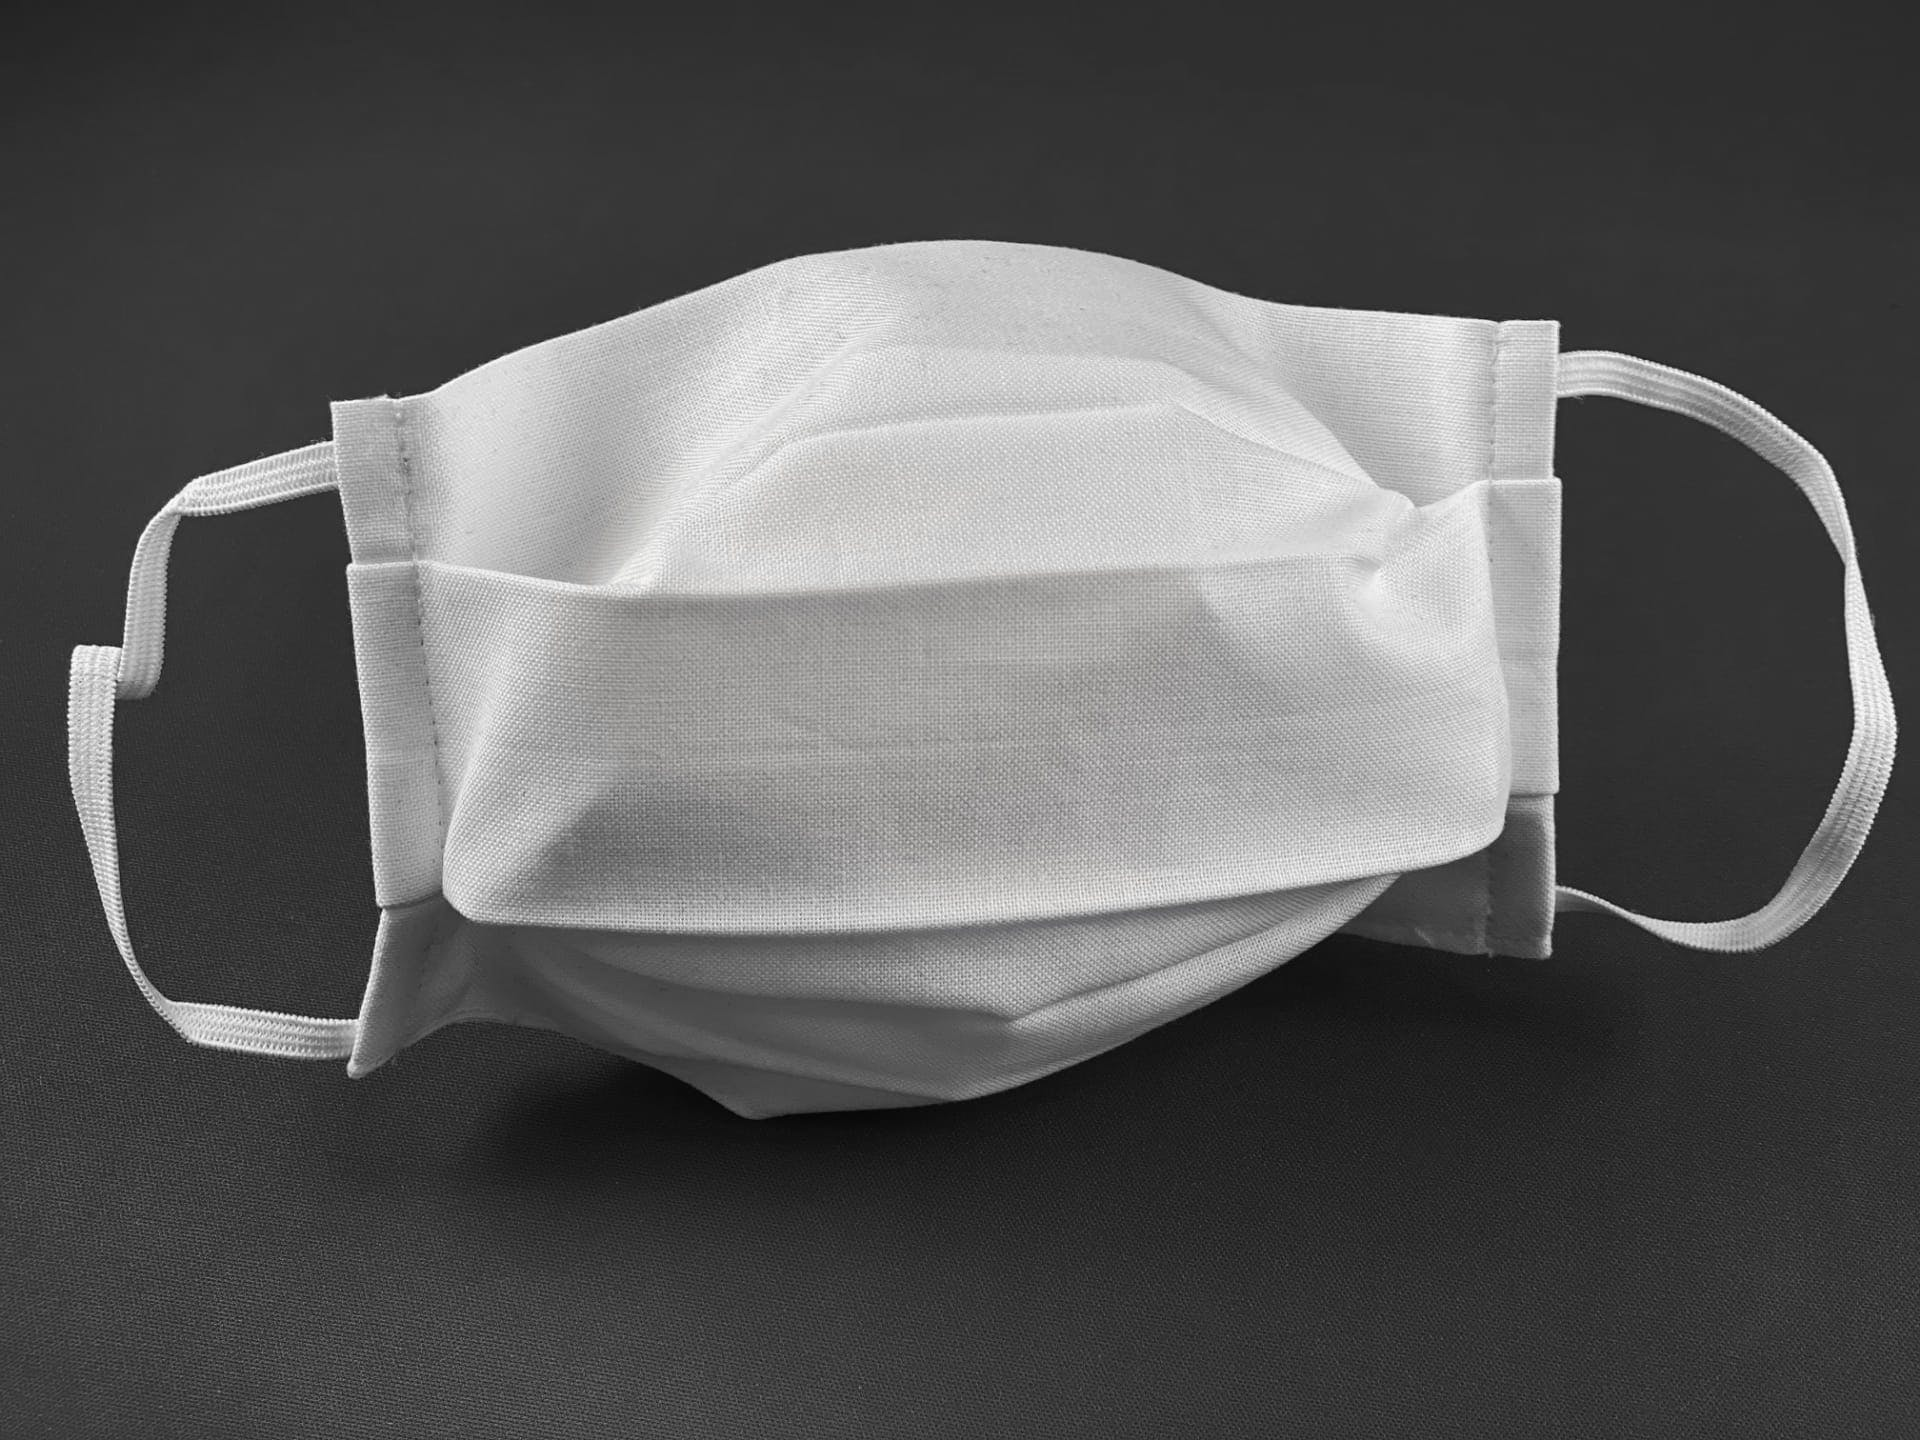 Masque de bouche OEKO-Tex - 5 Pièces